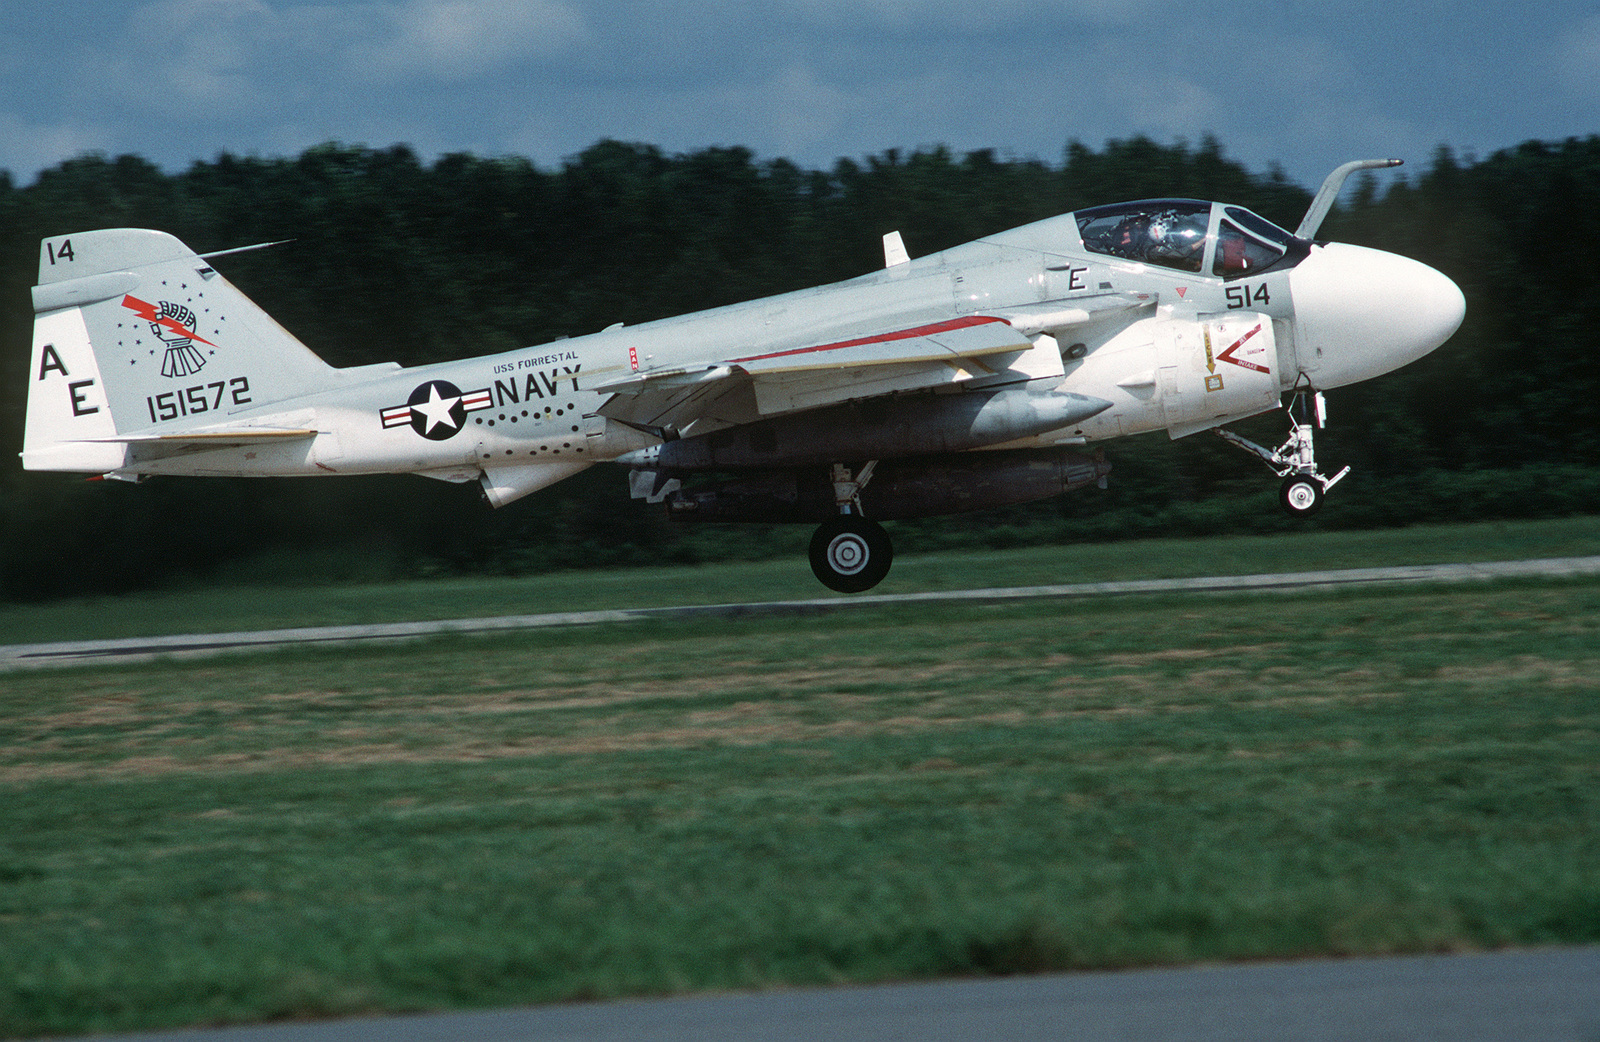 An Attack Squadron 176 (VA-176) A-6E Intruder aircraft takes off